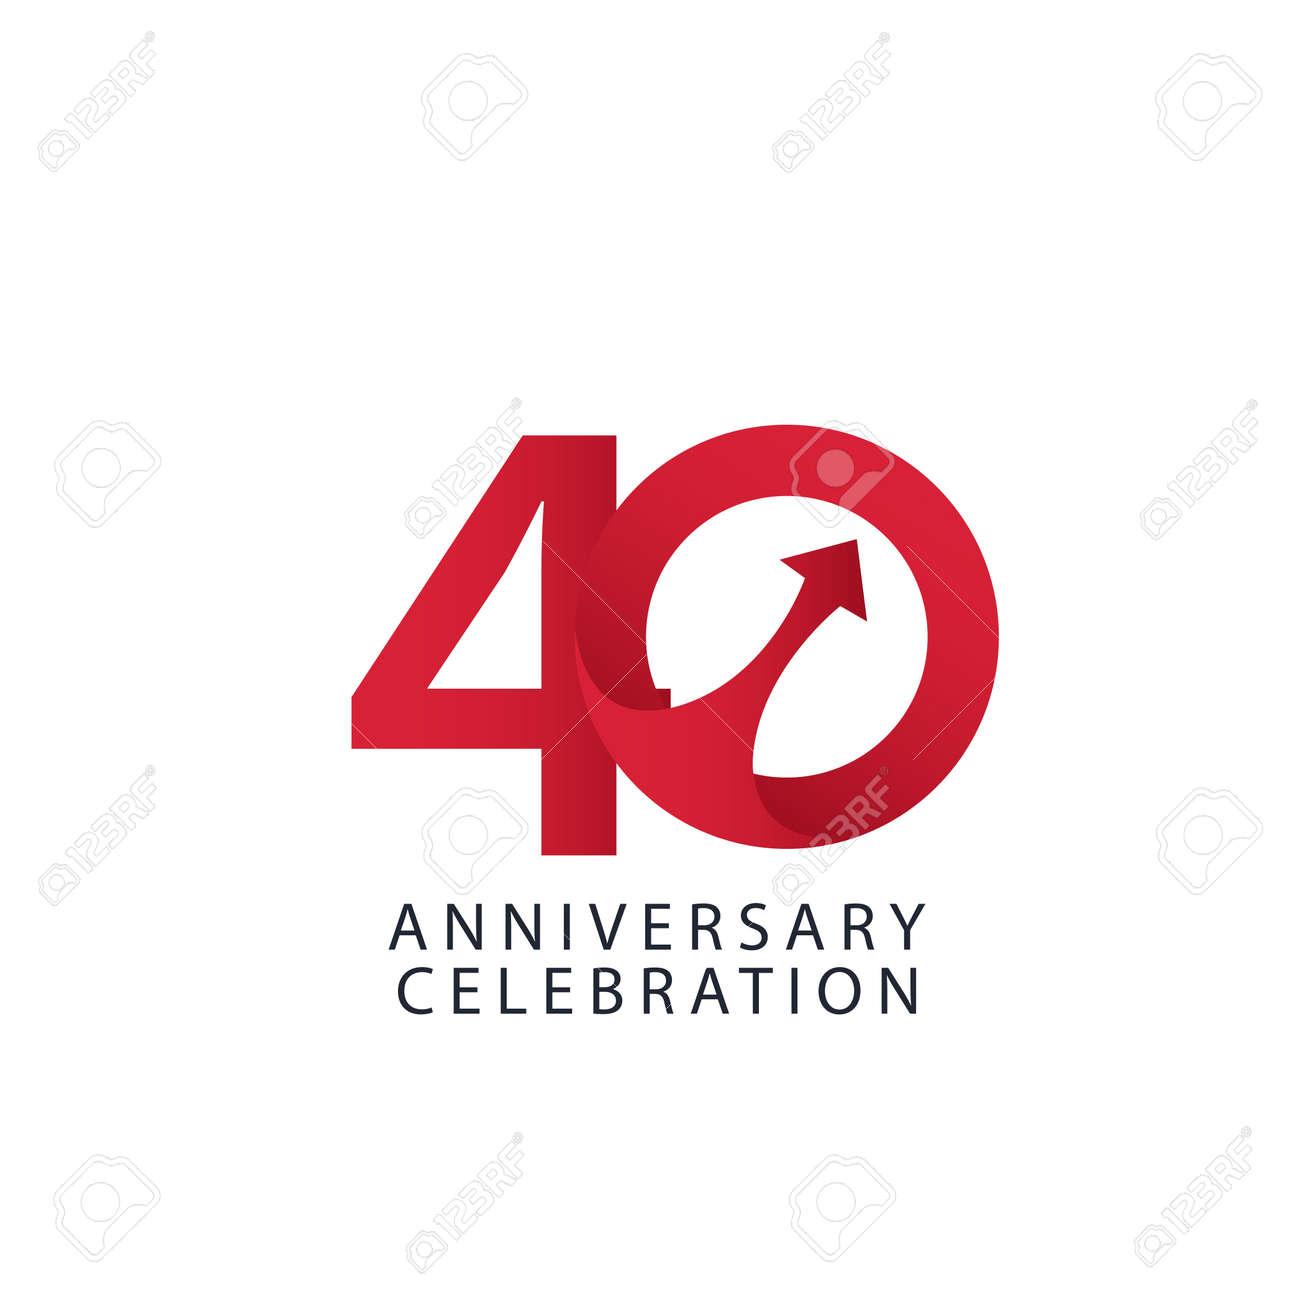 40 Years Anniversary Celebration Vector Template Design Illustration - 163698155